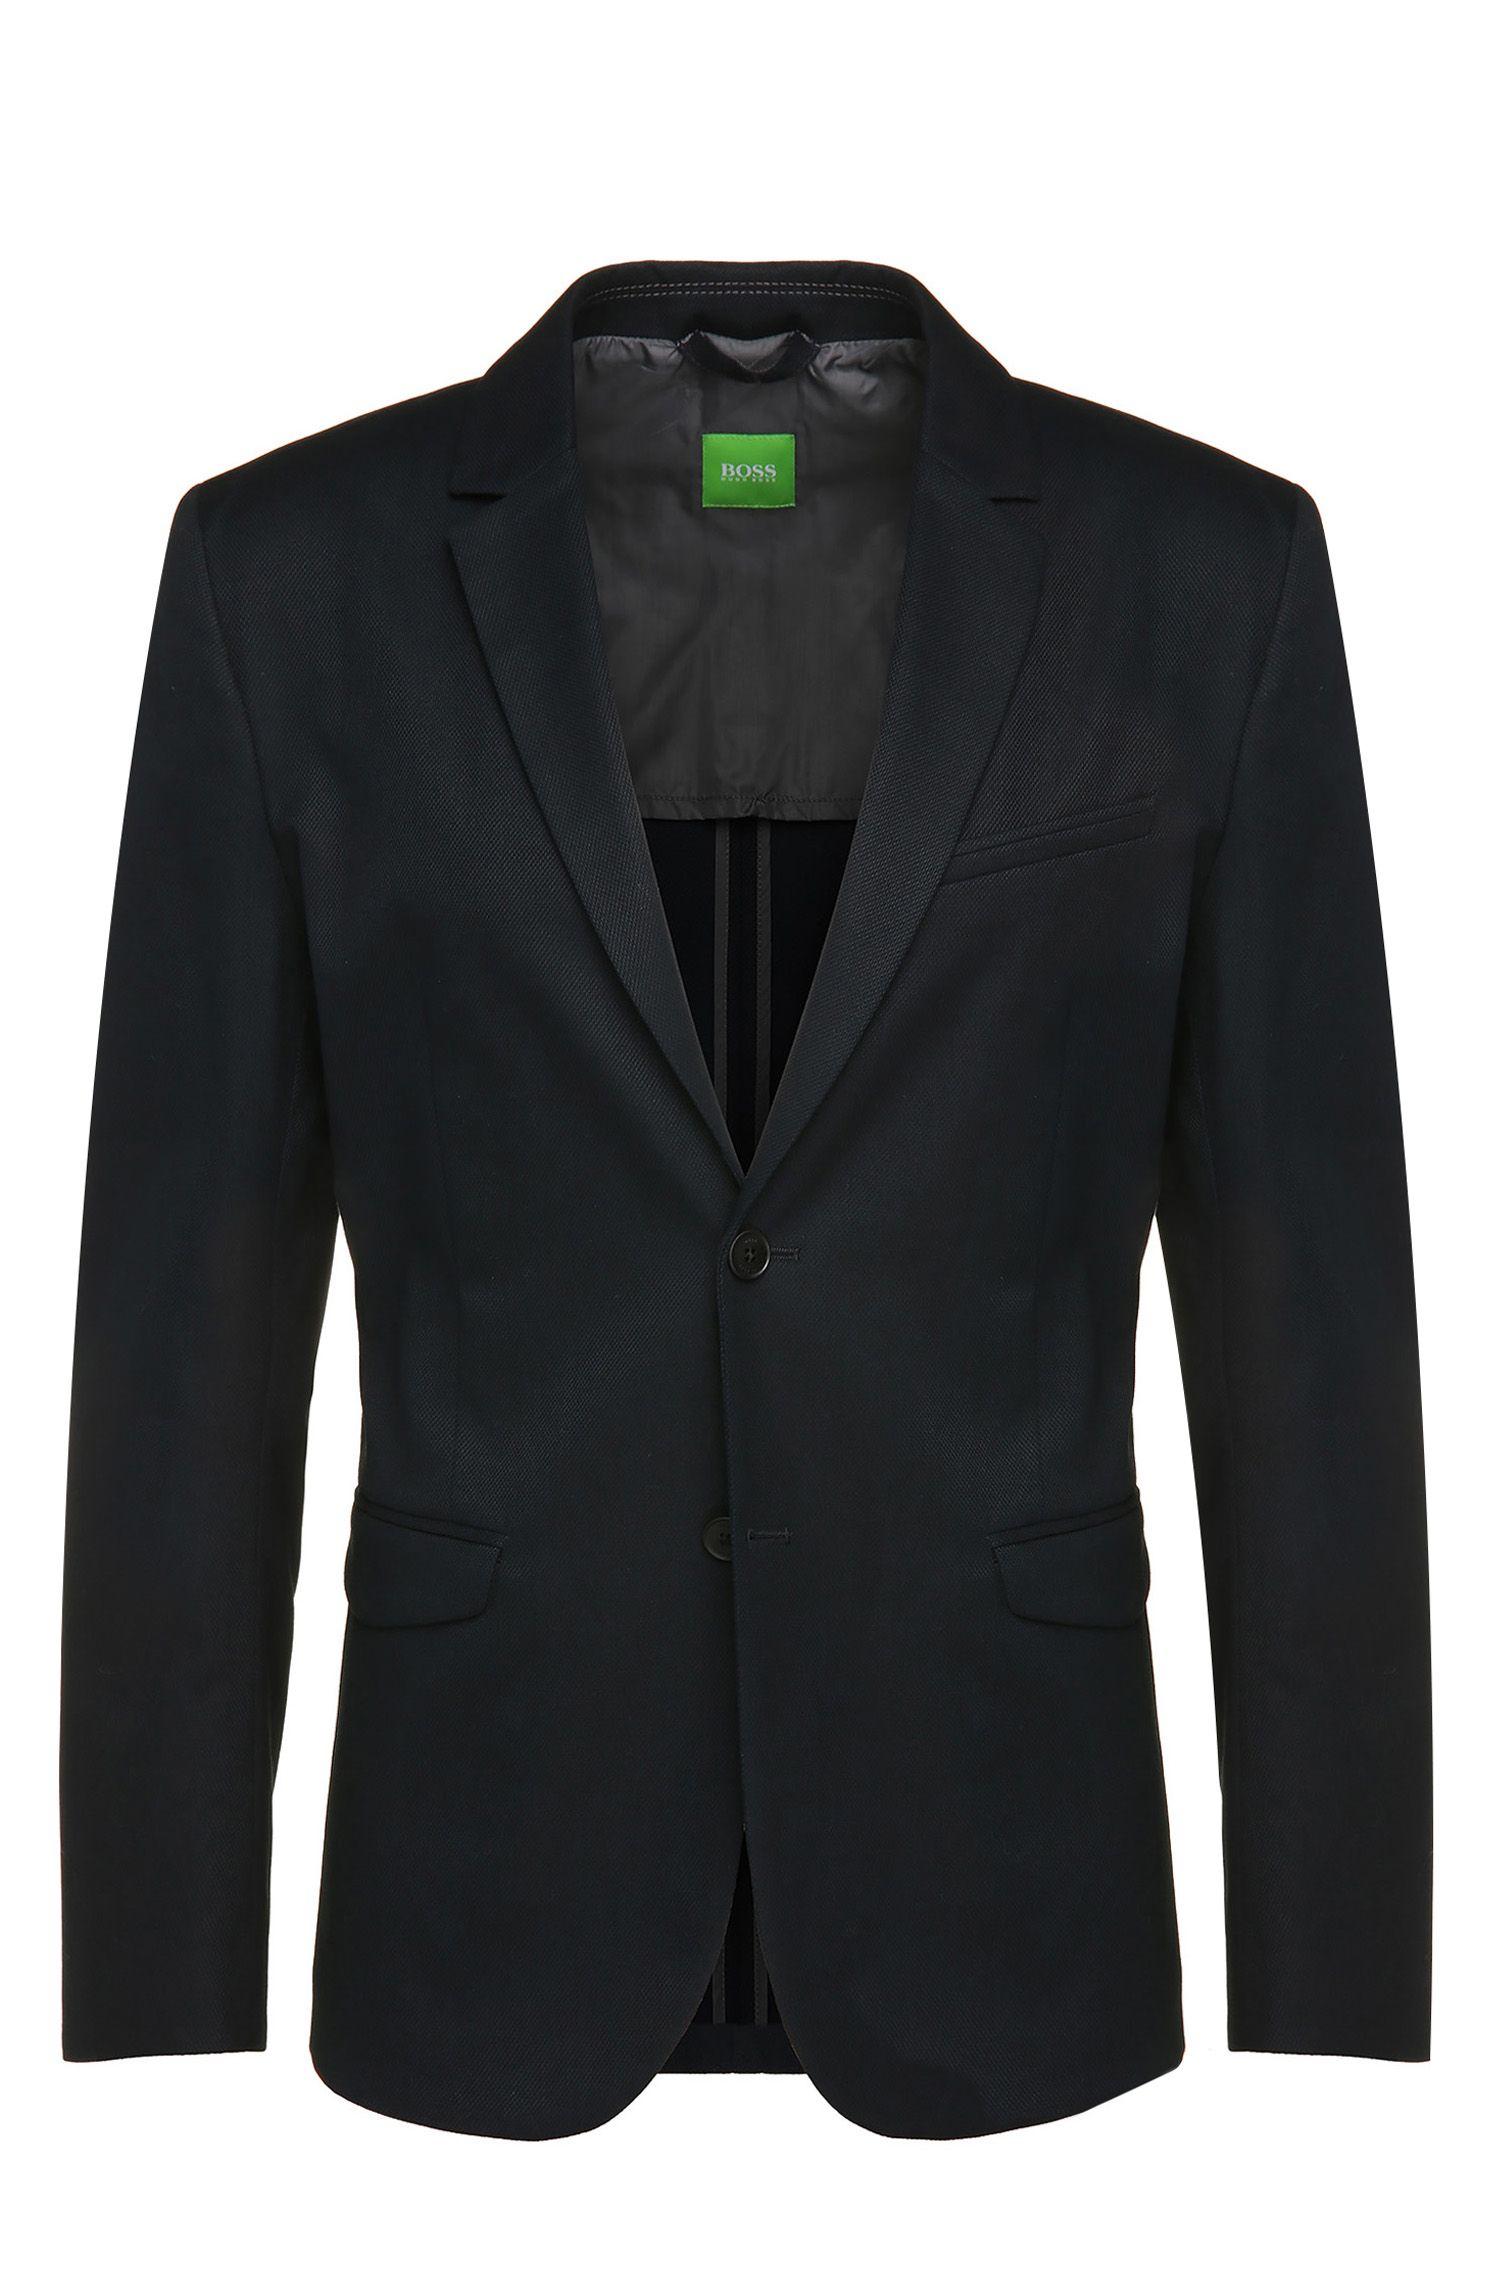 Cotton Textured Sport Coat, Slim Fit | Aymo